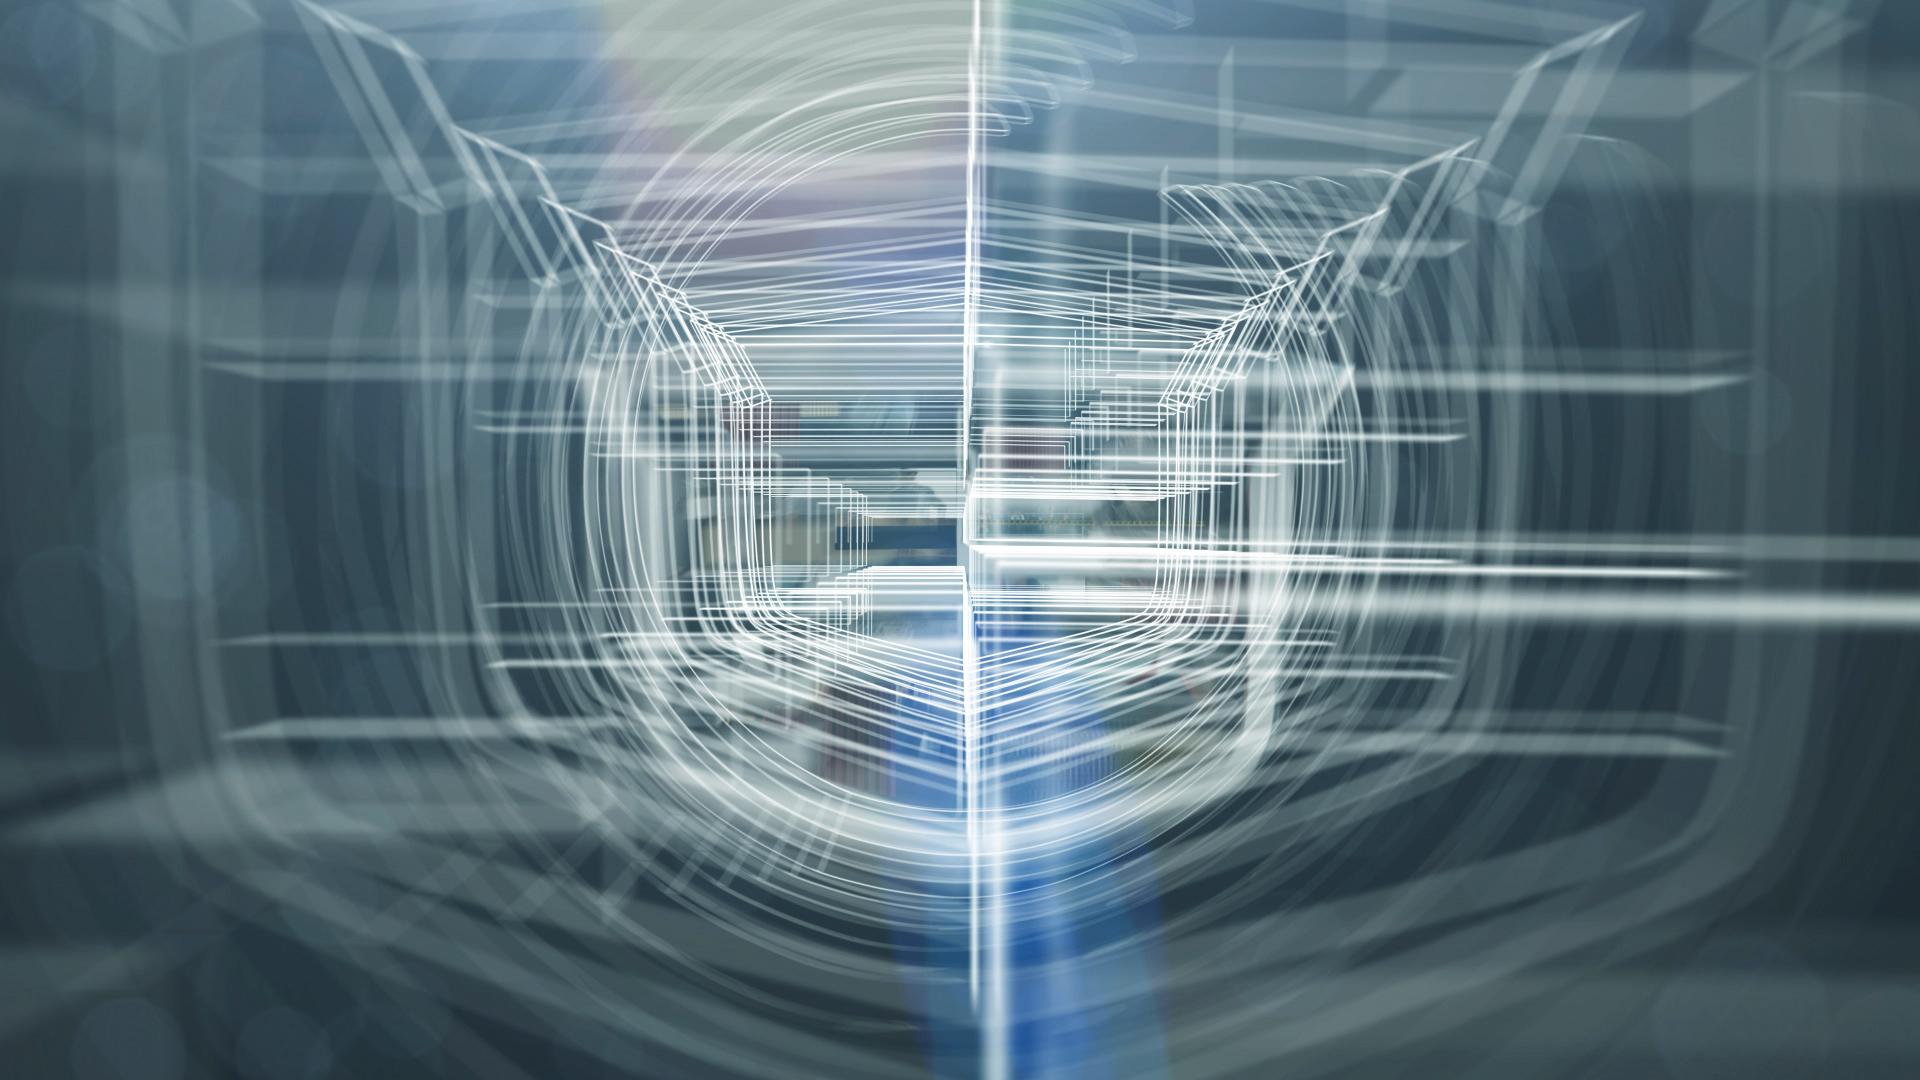 CTS-V_GMEV0166000H_HD-PRORES_LABREEL__2_00070_o.jpg